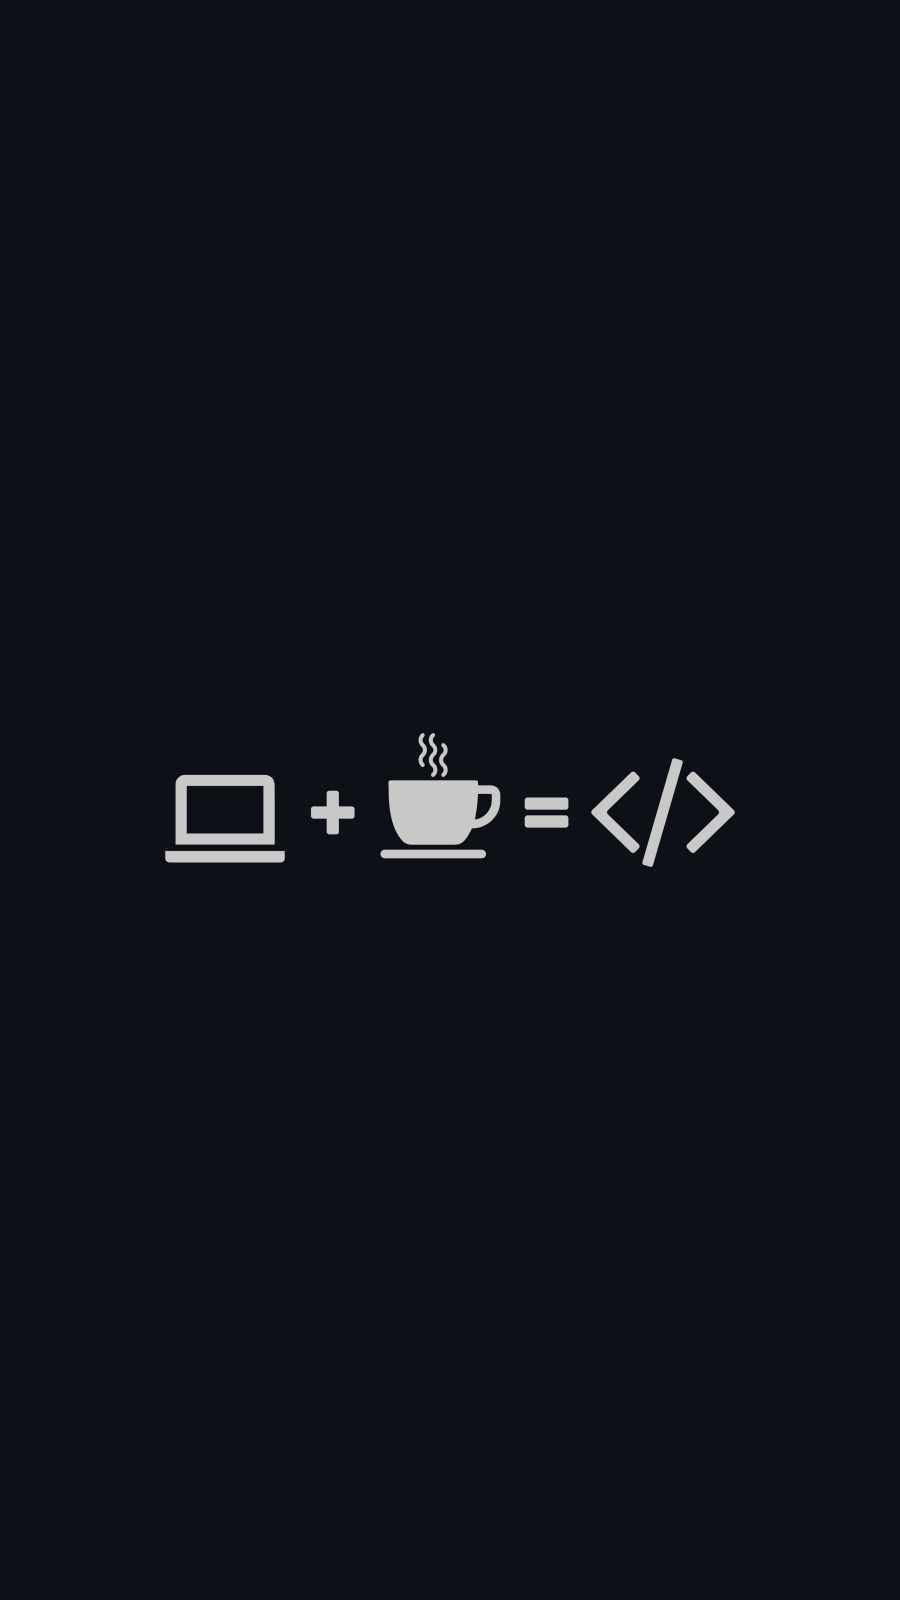 Coder Life iPhone Wallpaper